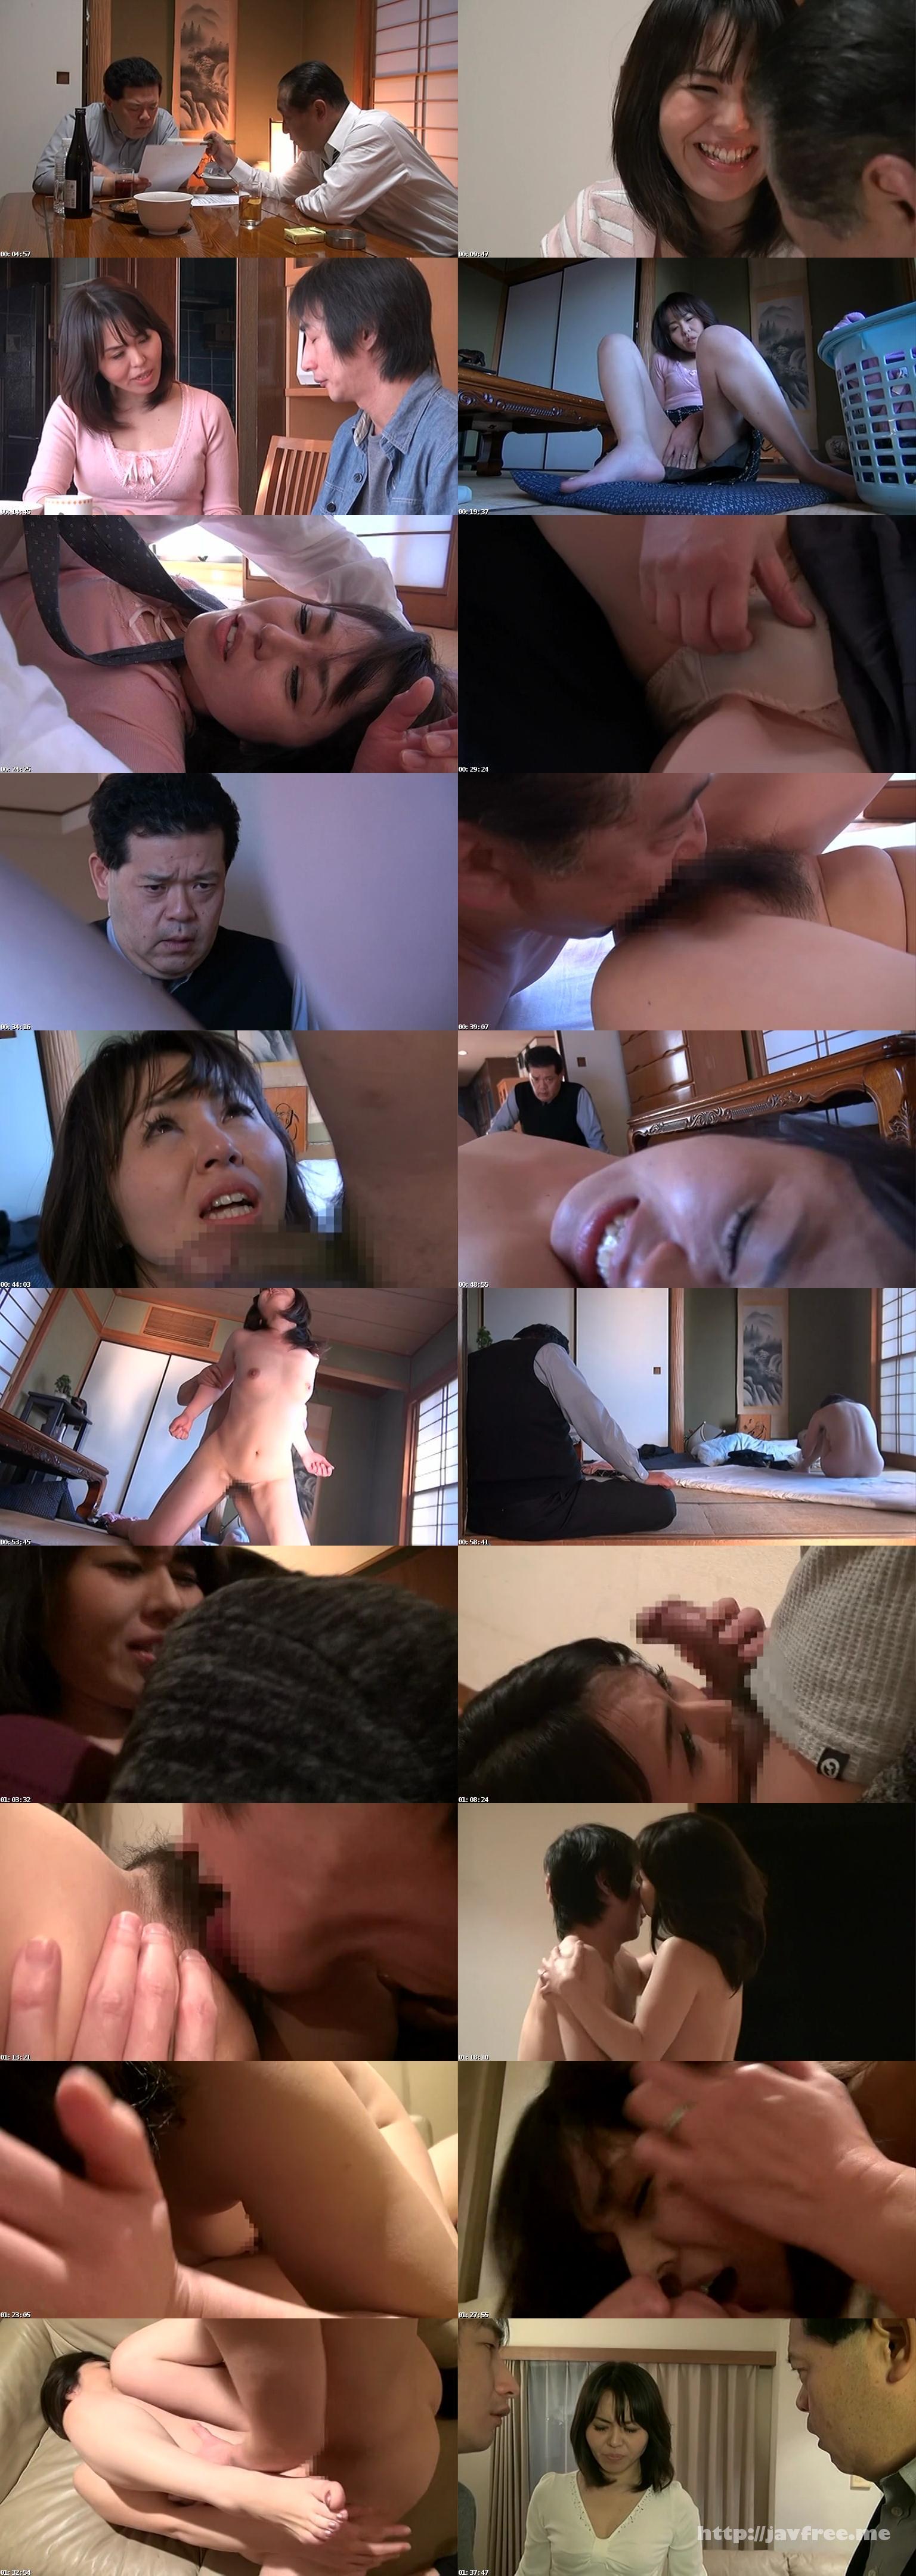 [TMRD 688] 熟妻 近親相姦 夫の前で義兄に犯され、息子への溺愛の果てに… 美月桃々子 美月桃々子 TMRD